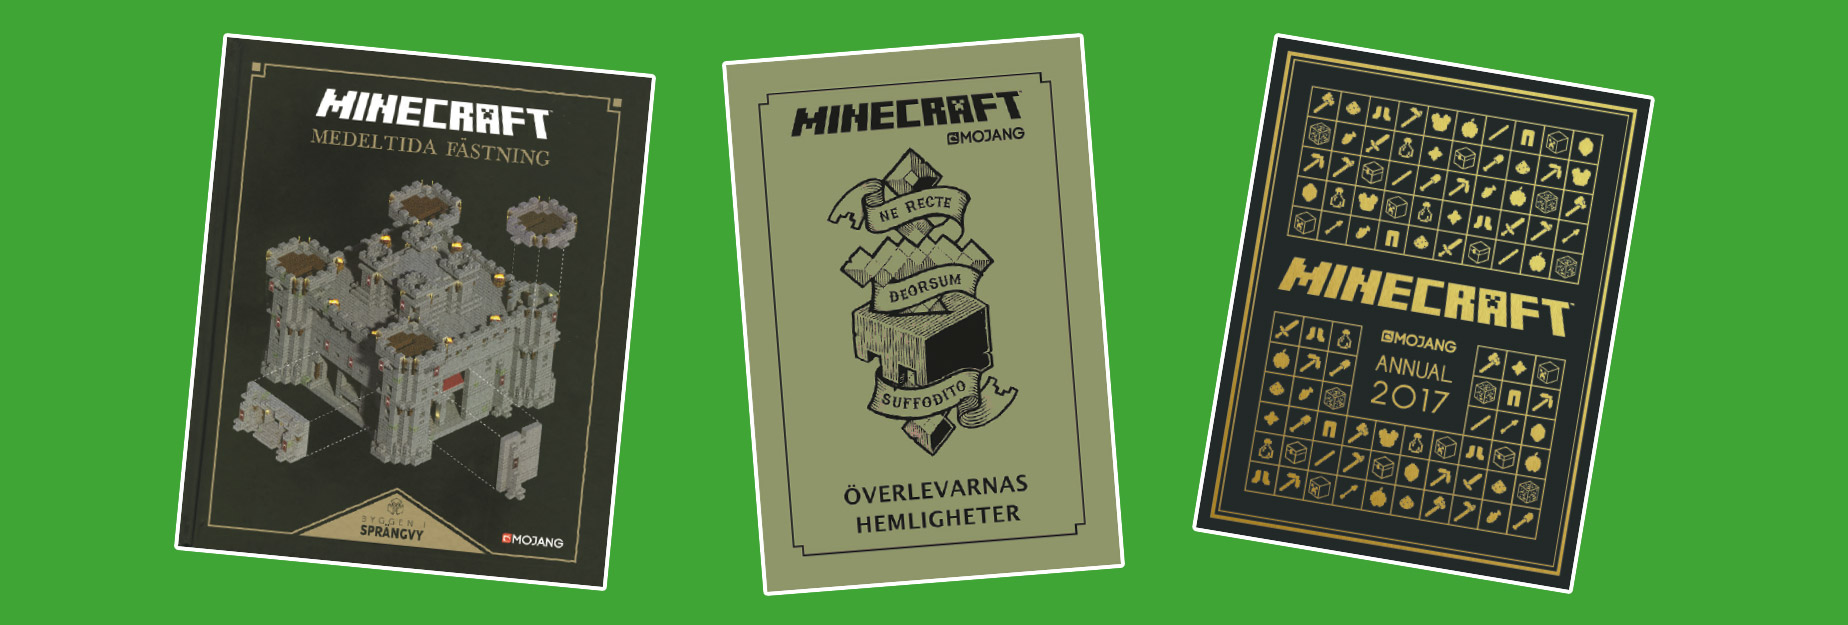 Minecraft-tävling